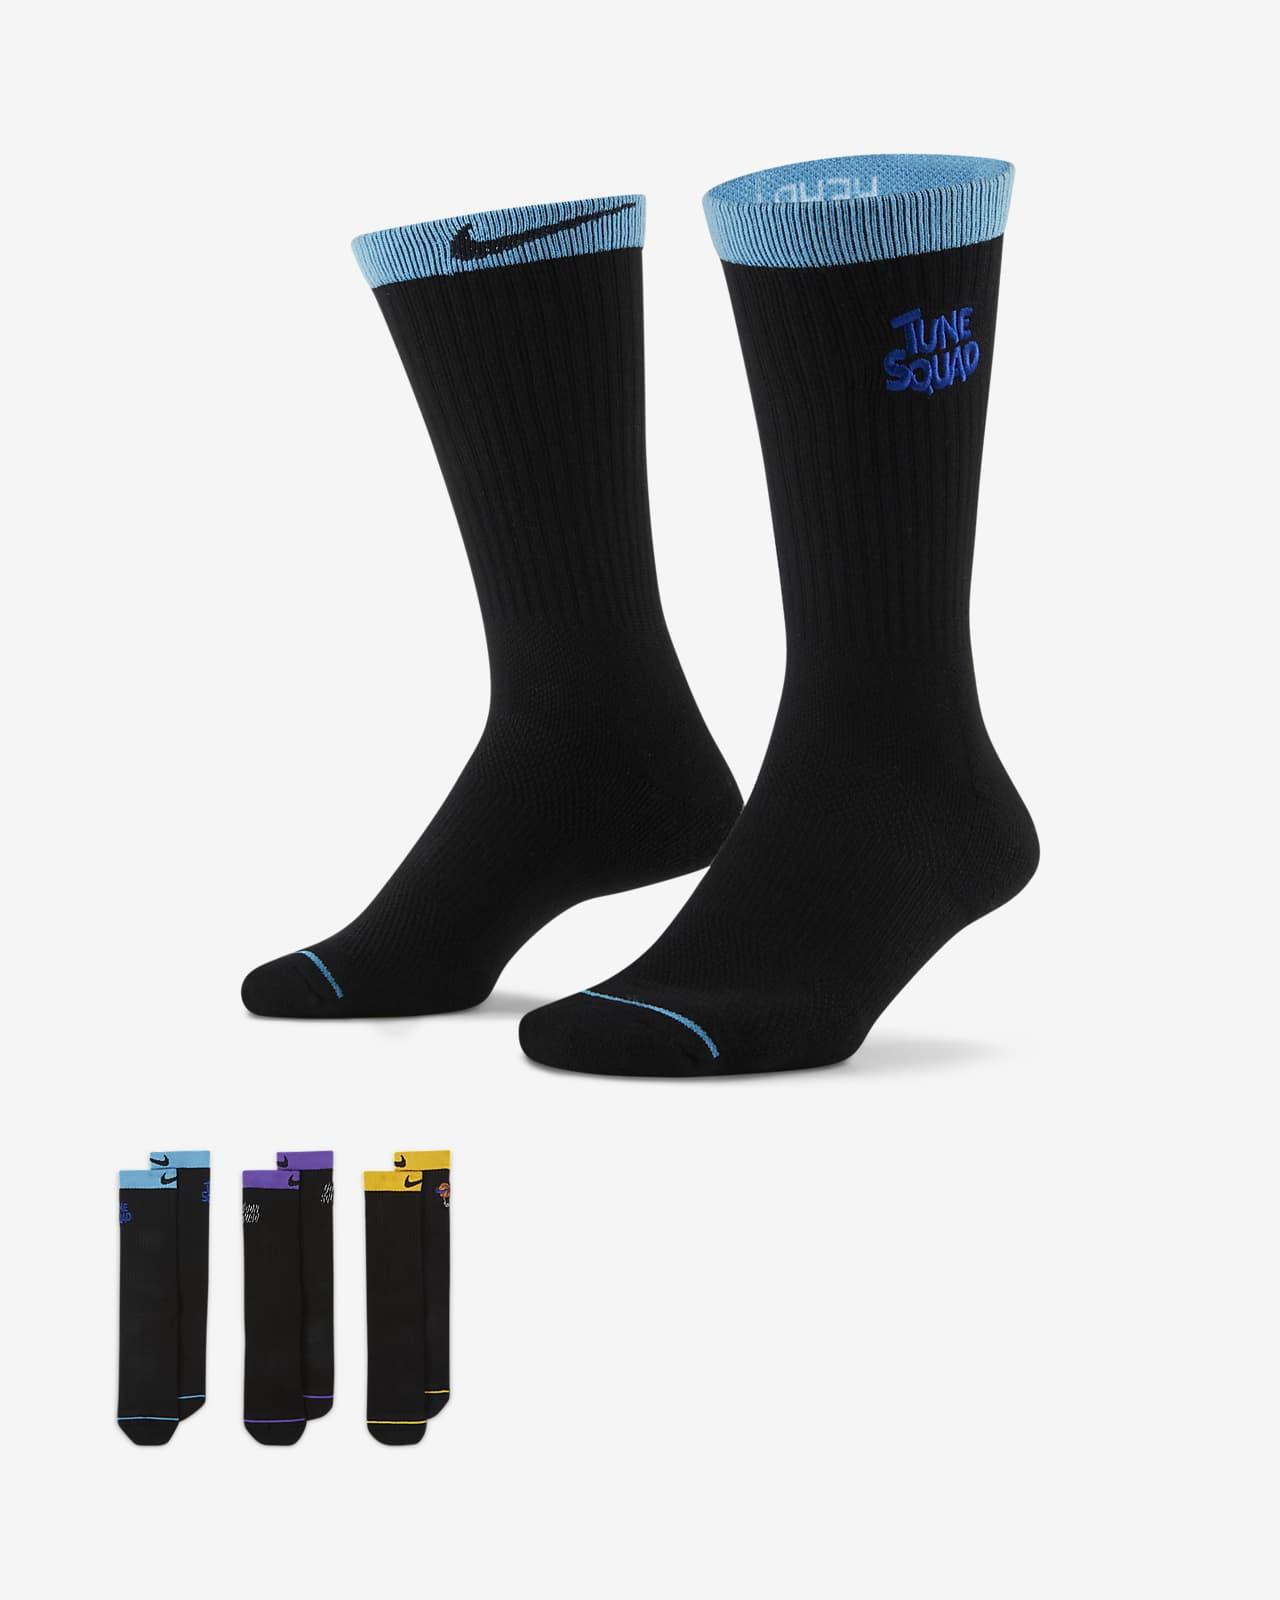 Chaussettes de basketball mi-mollet Nike x Space Jam: A New Legacy (3paires)